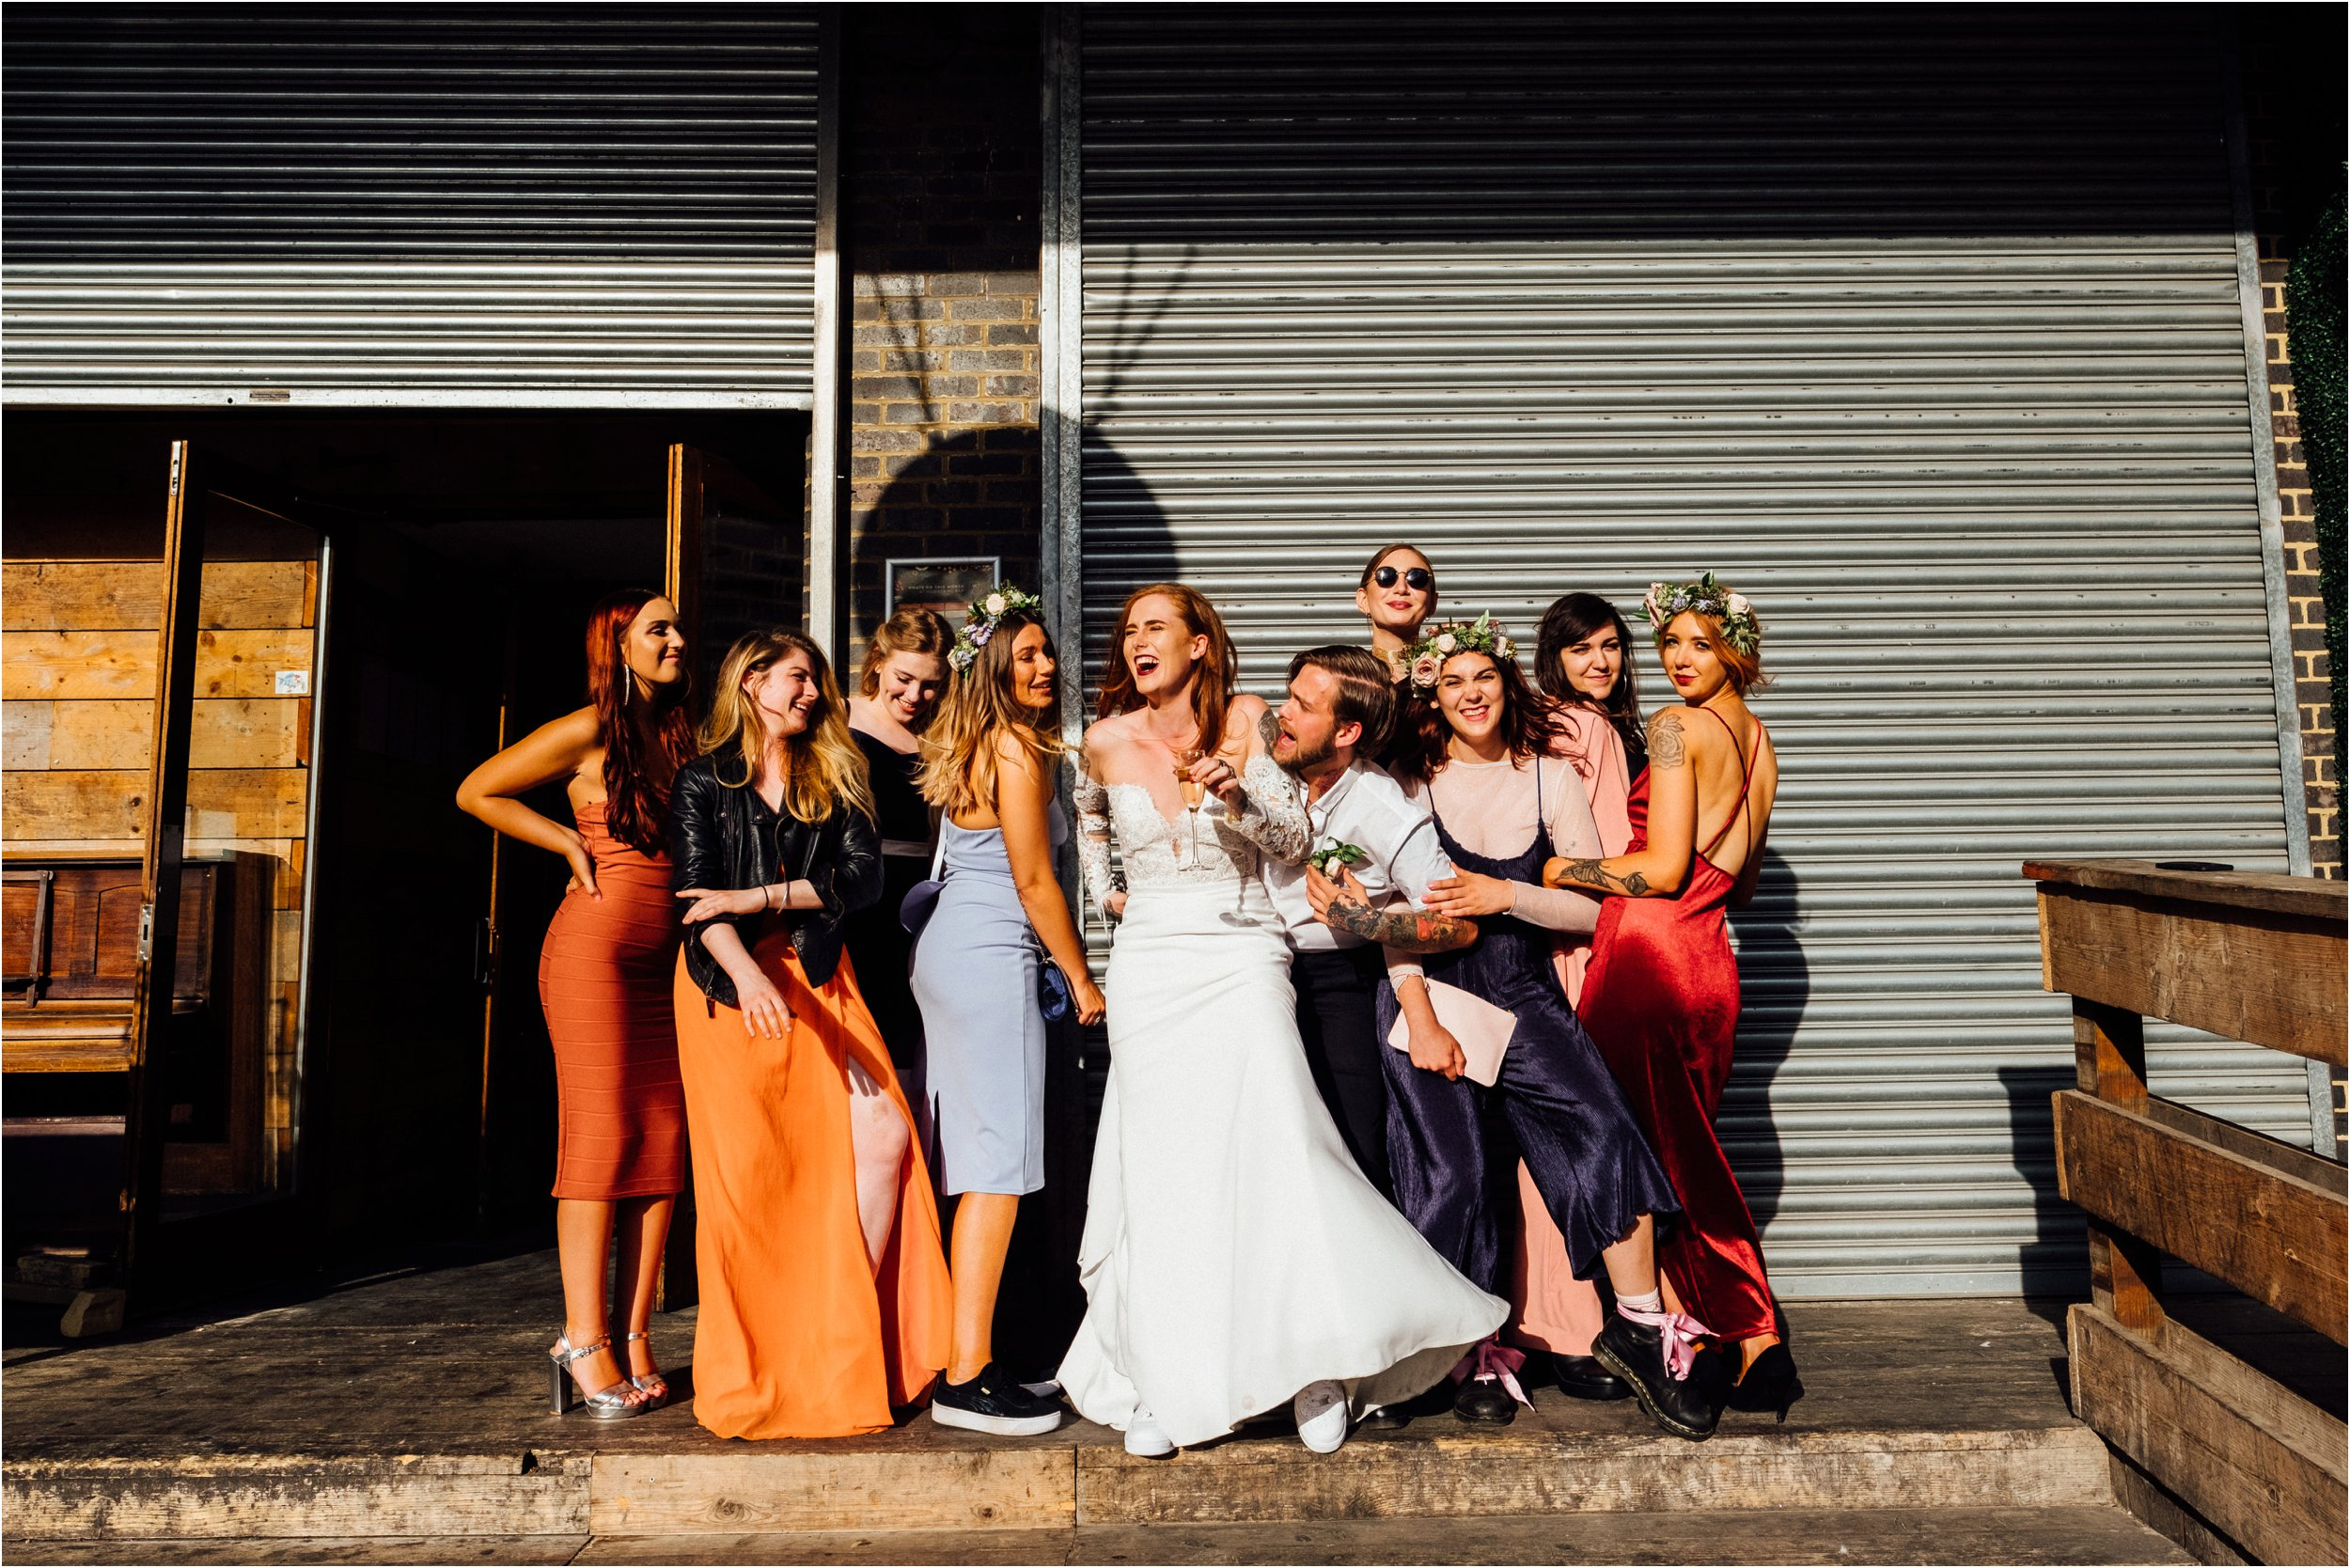 Hackney town hall wedding photography_0183.jpg